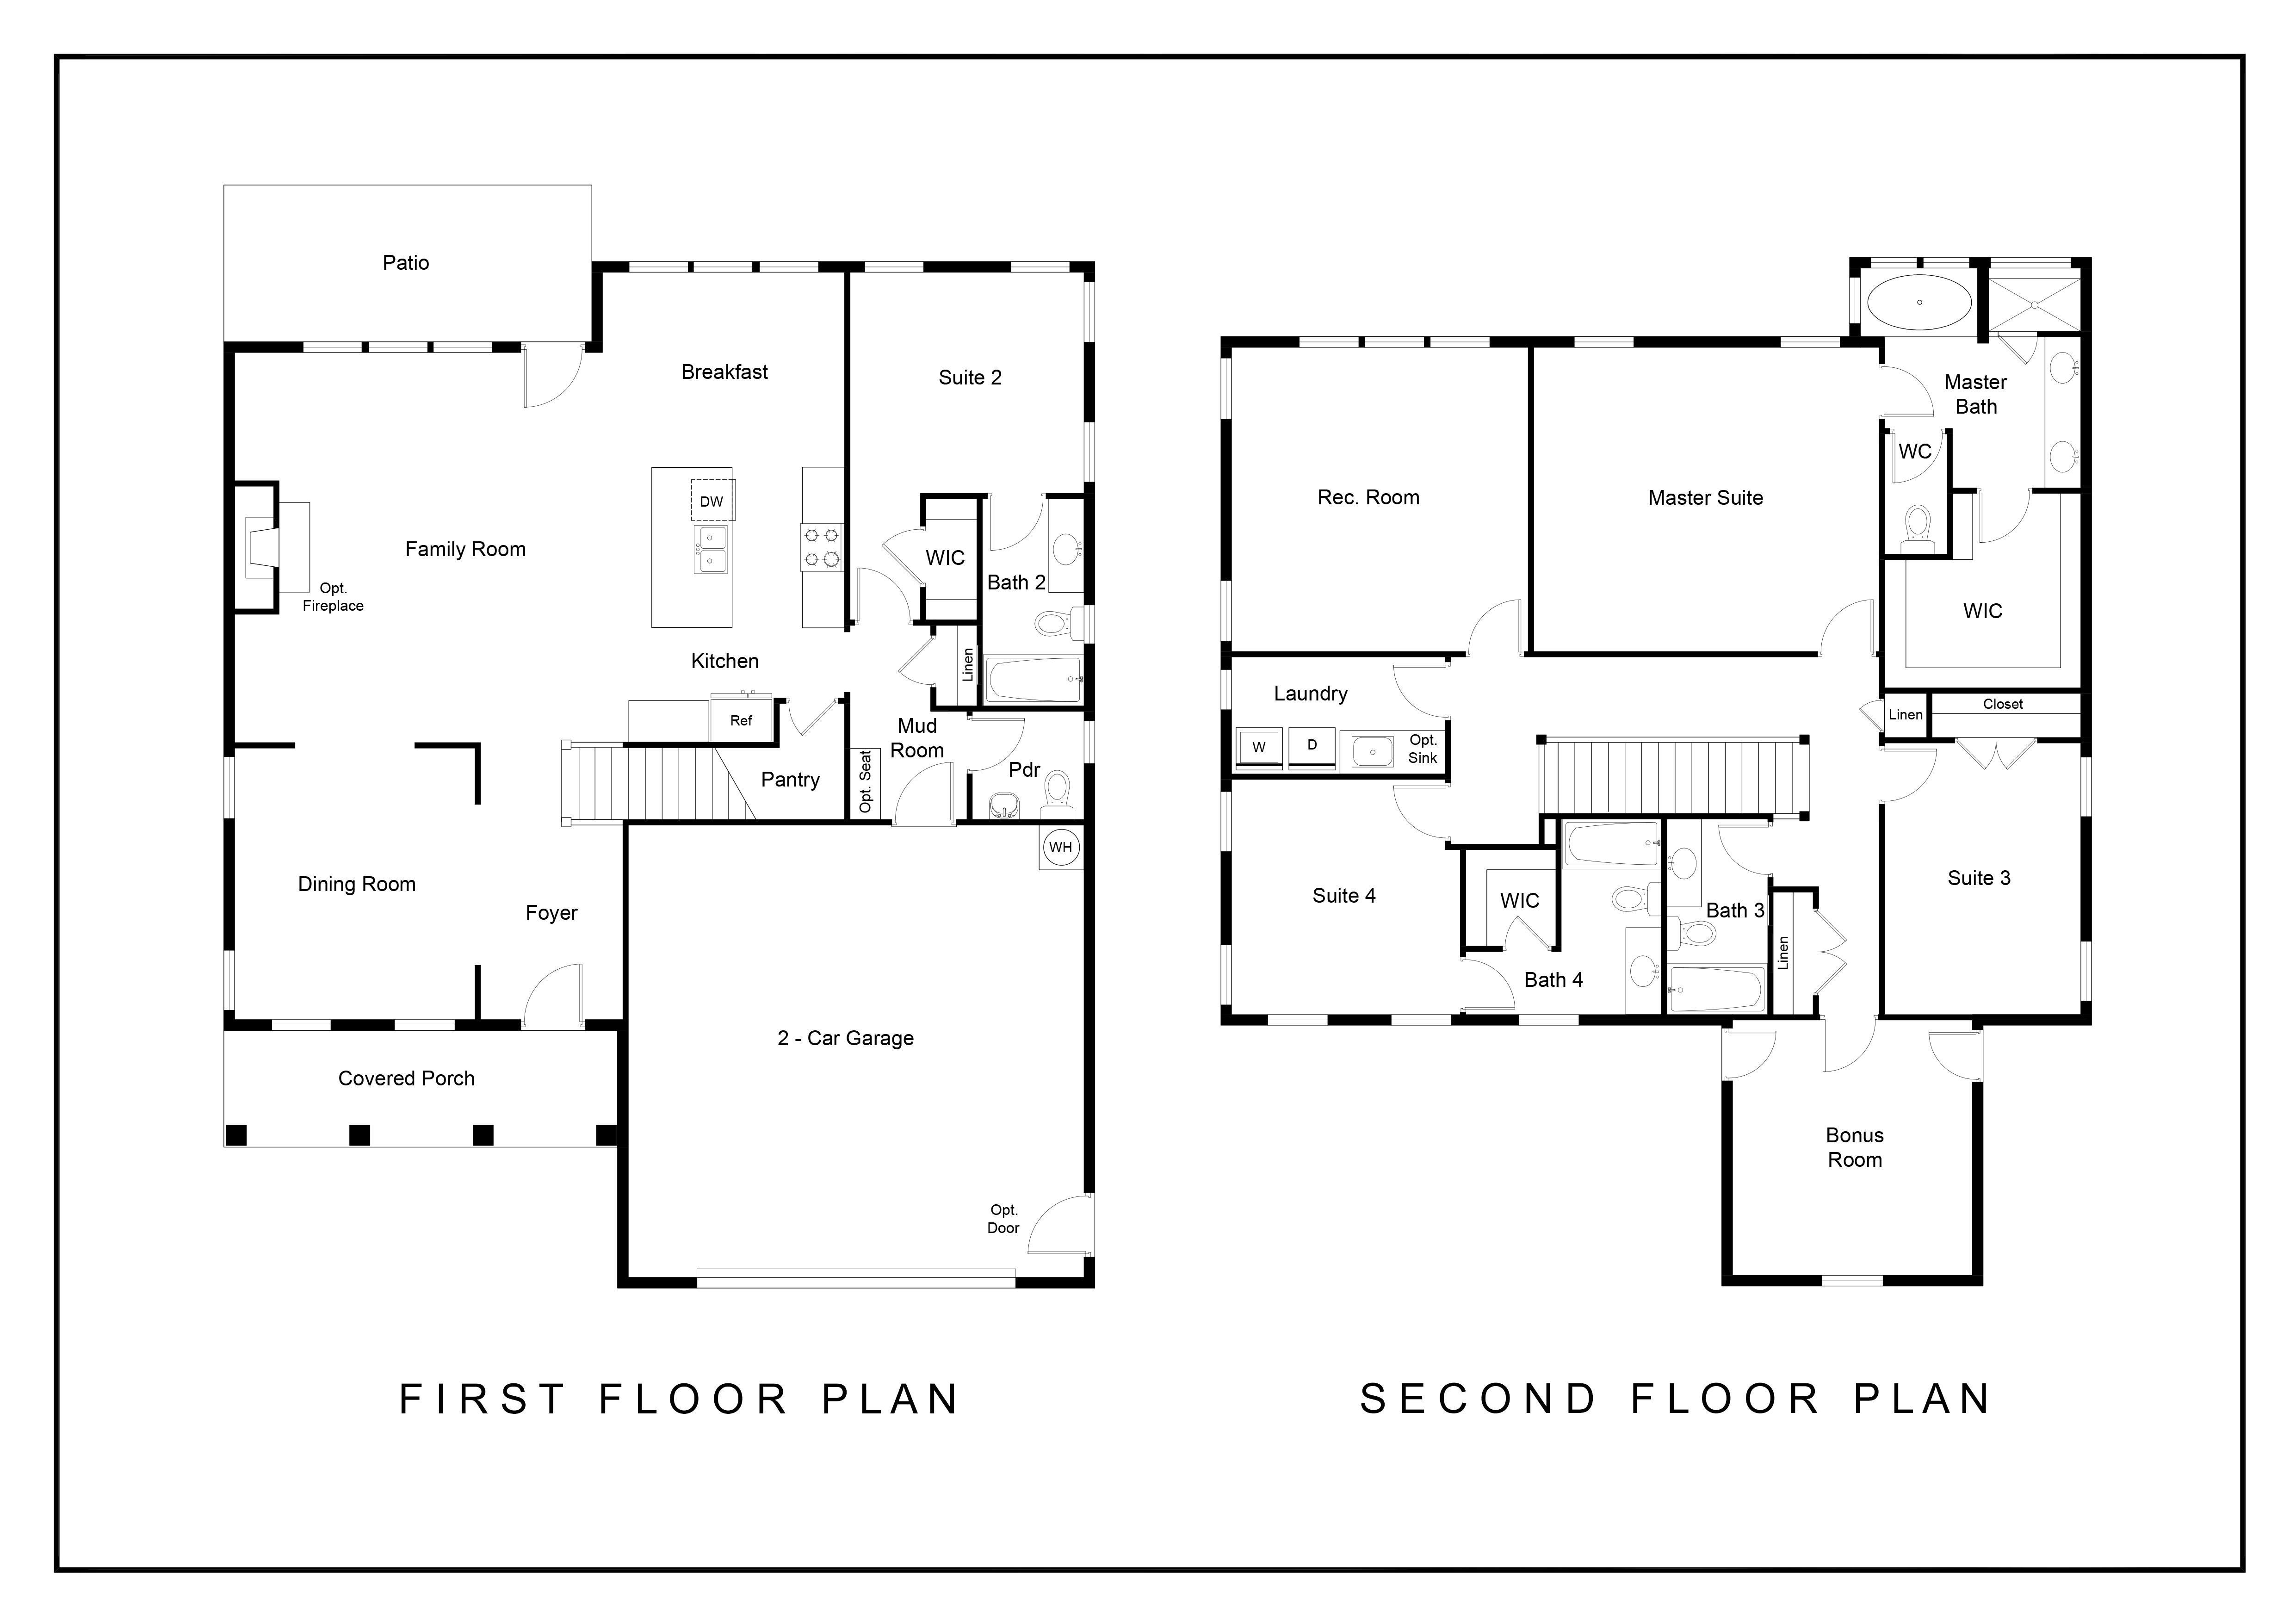 sycamore floorplan